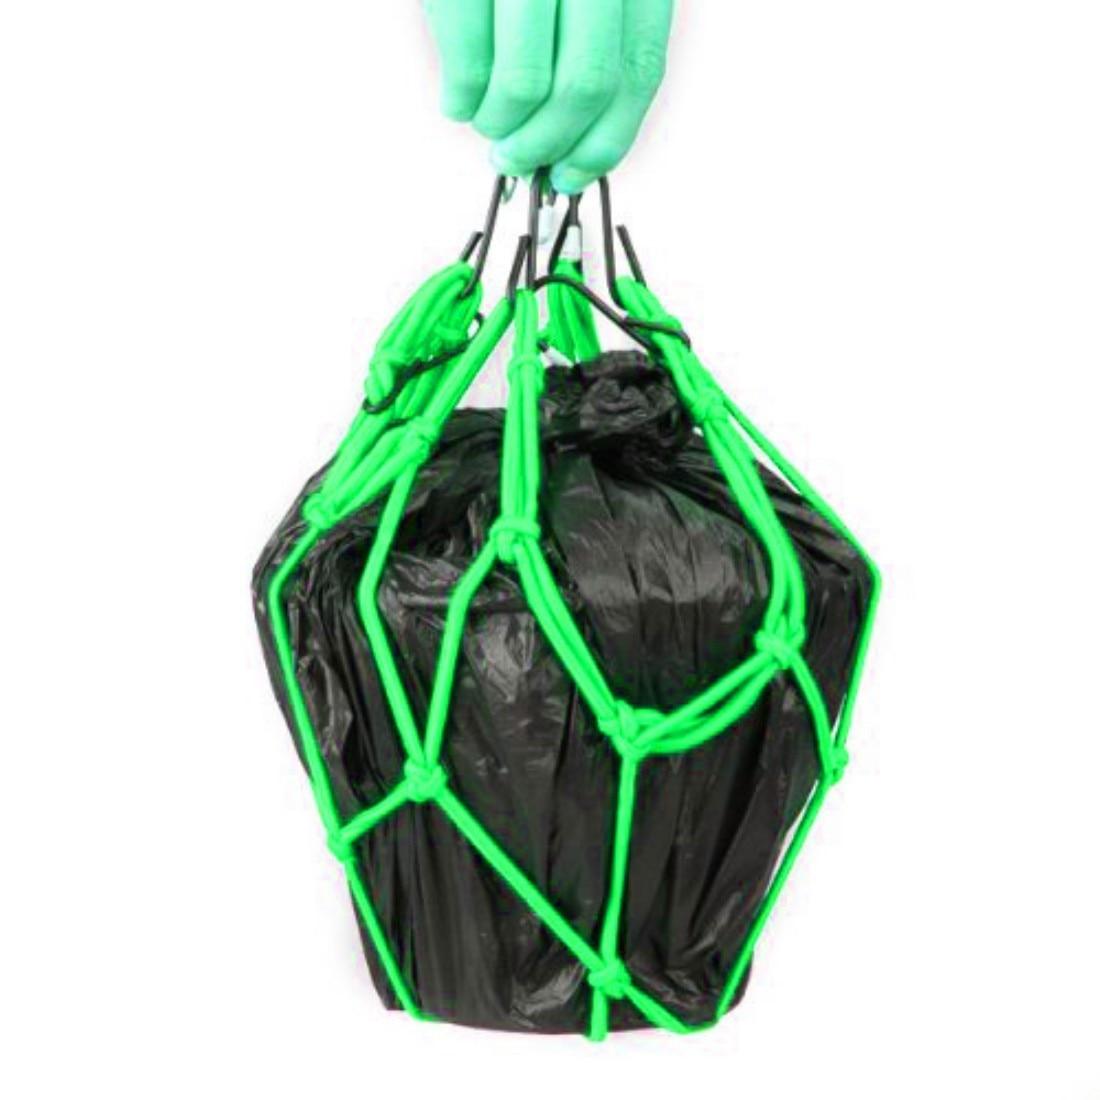 Dewtreetali 30*30cm Motorcycle Bike 6 Hooks Hold down Fuel Tank Luggage Net Mesh Web Bungee Green Color